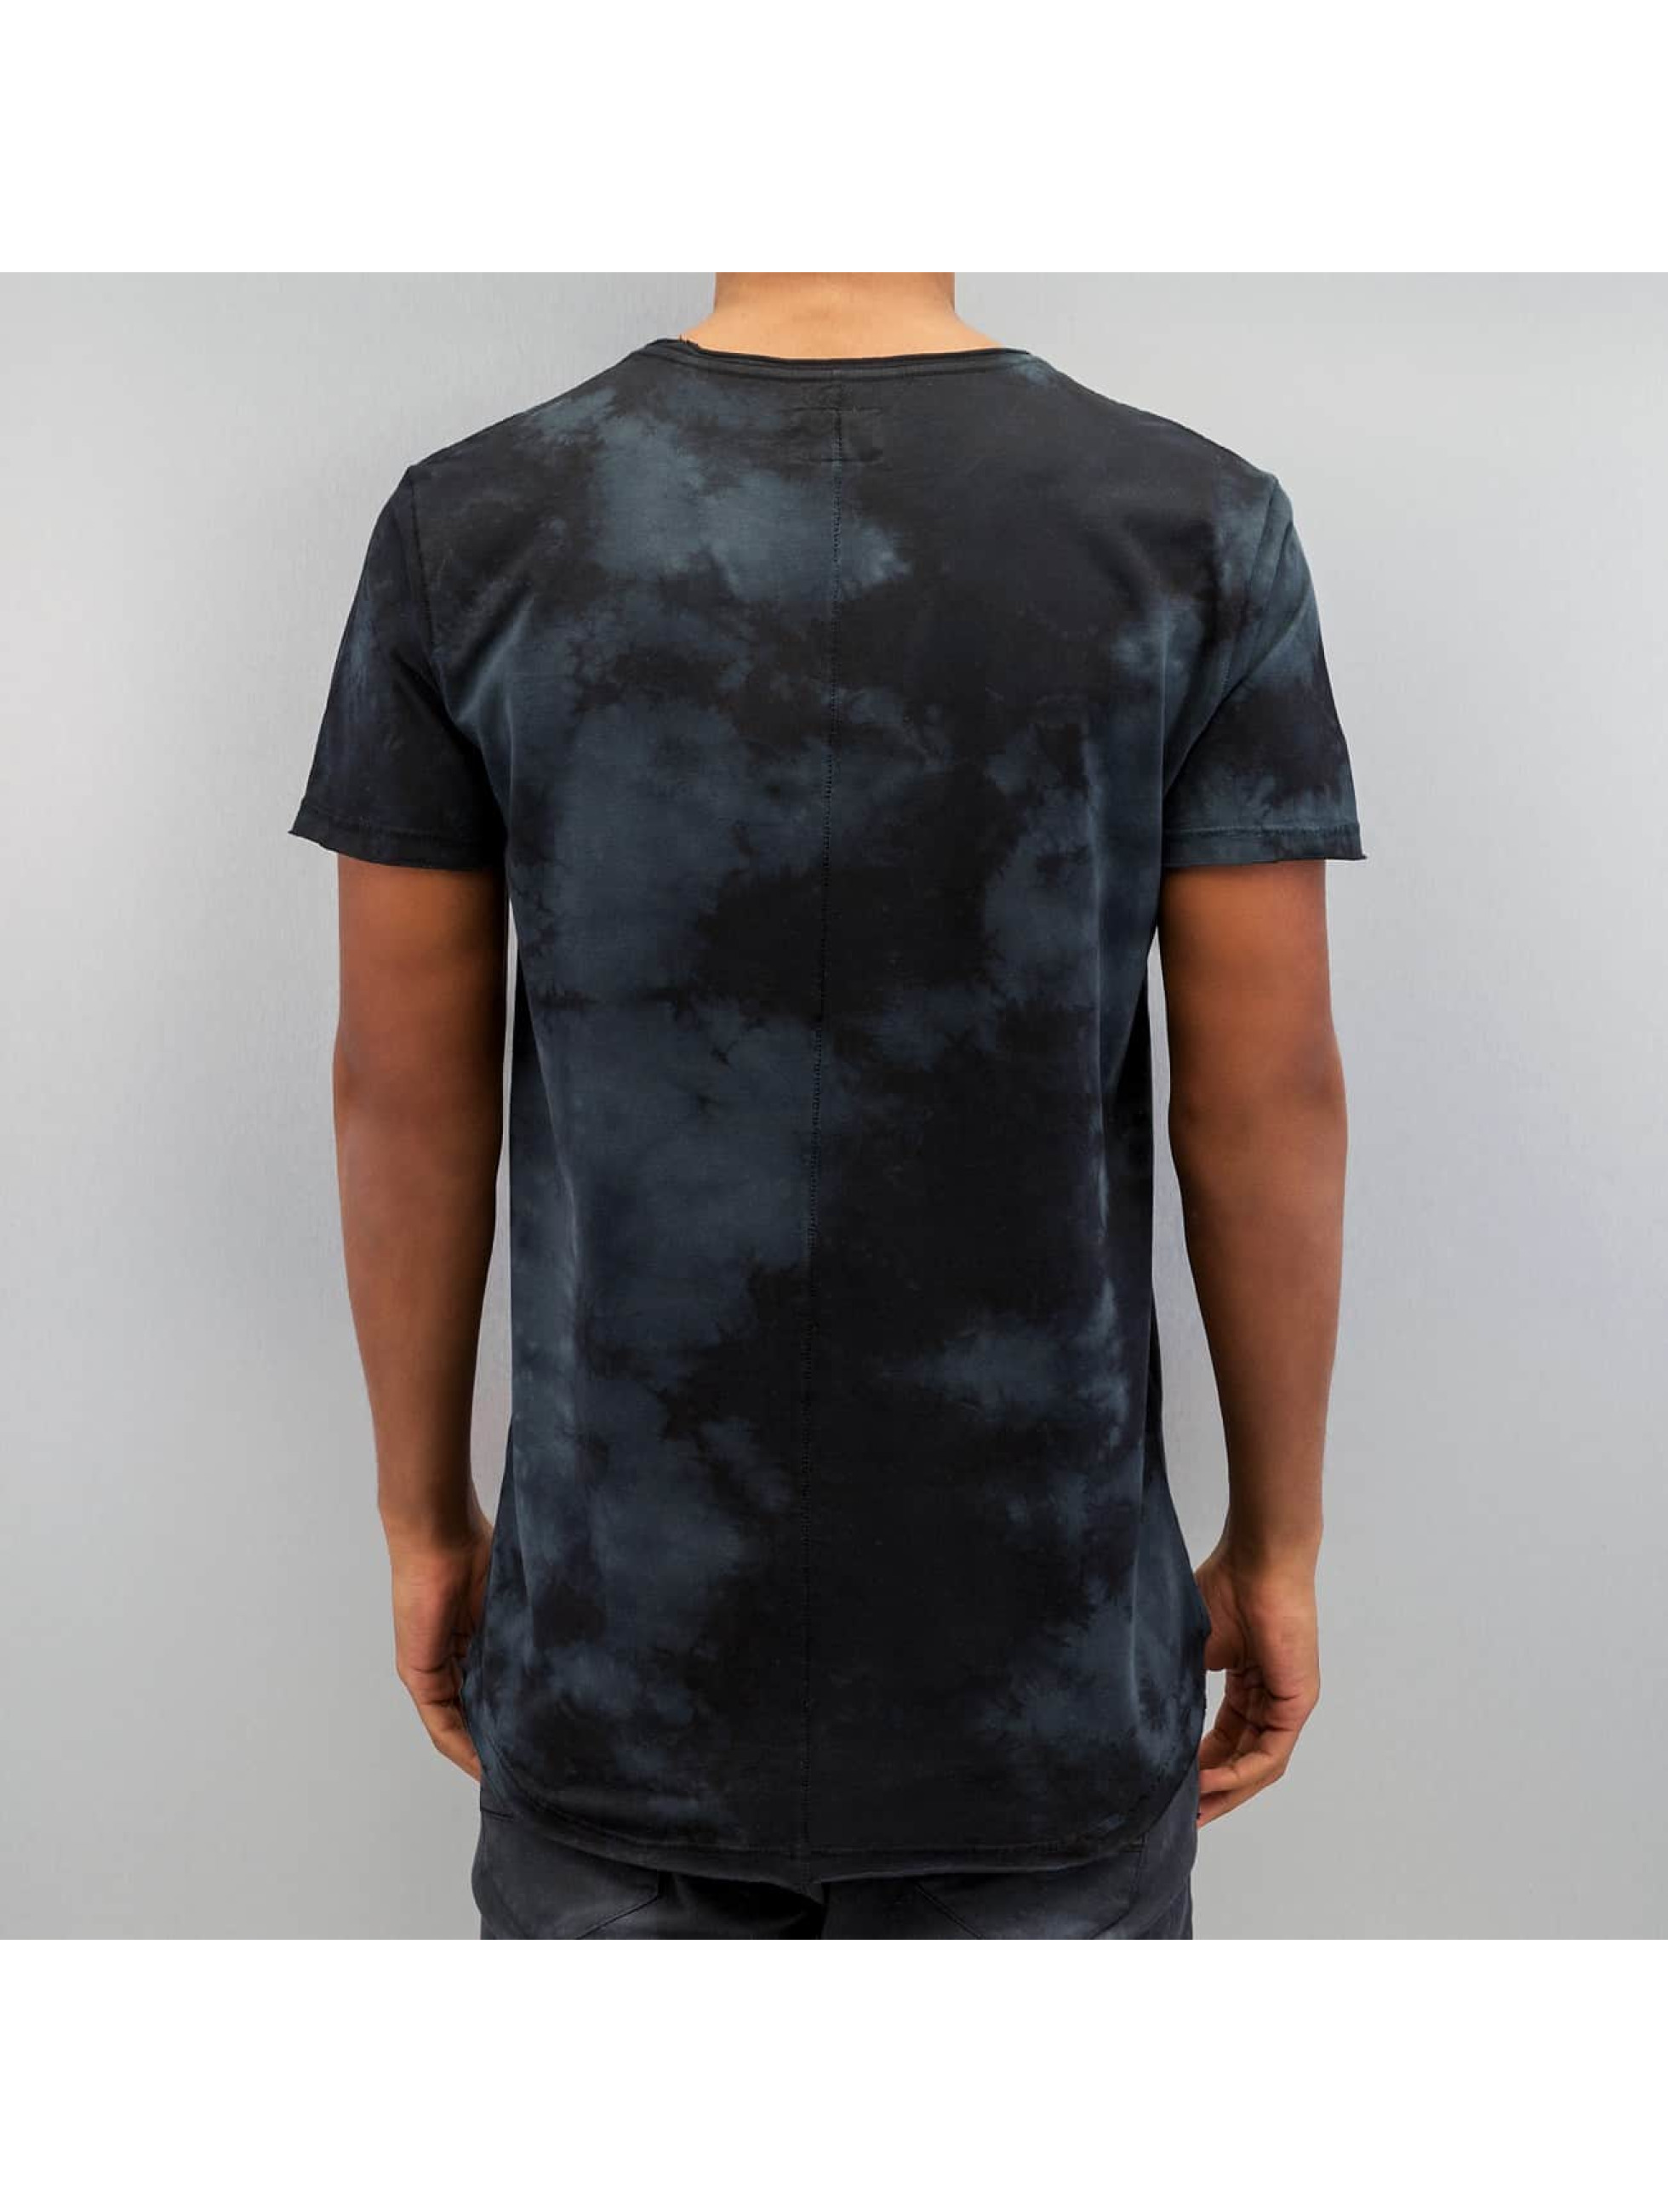 SHINE Original t-shirt Acid Washed grijs